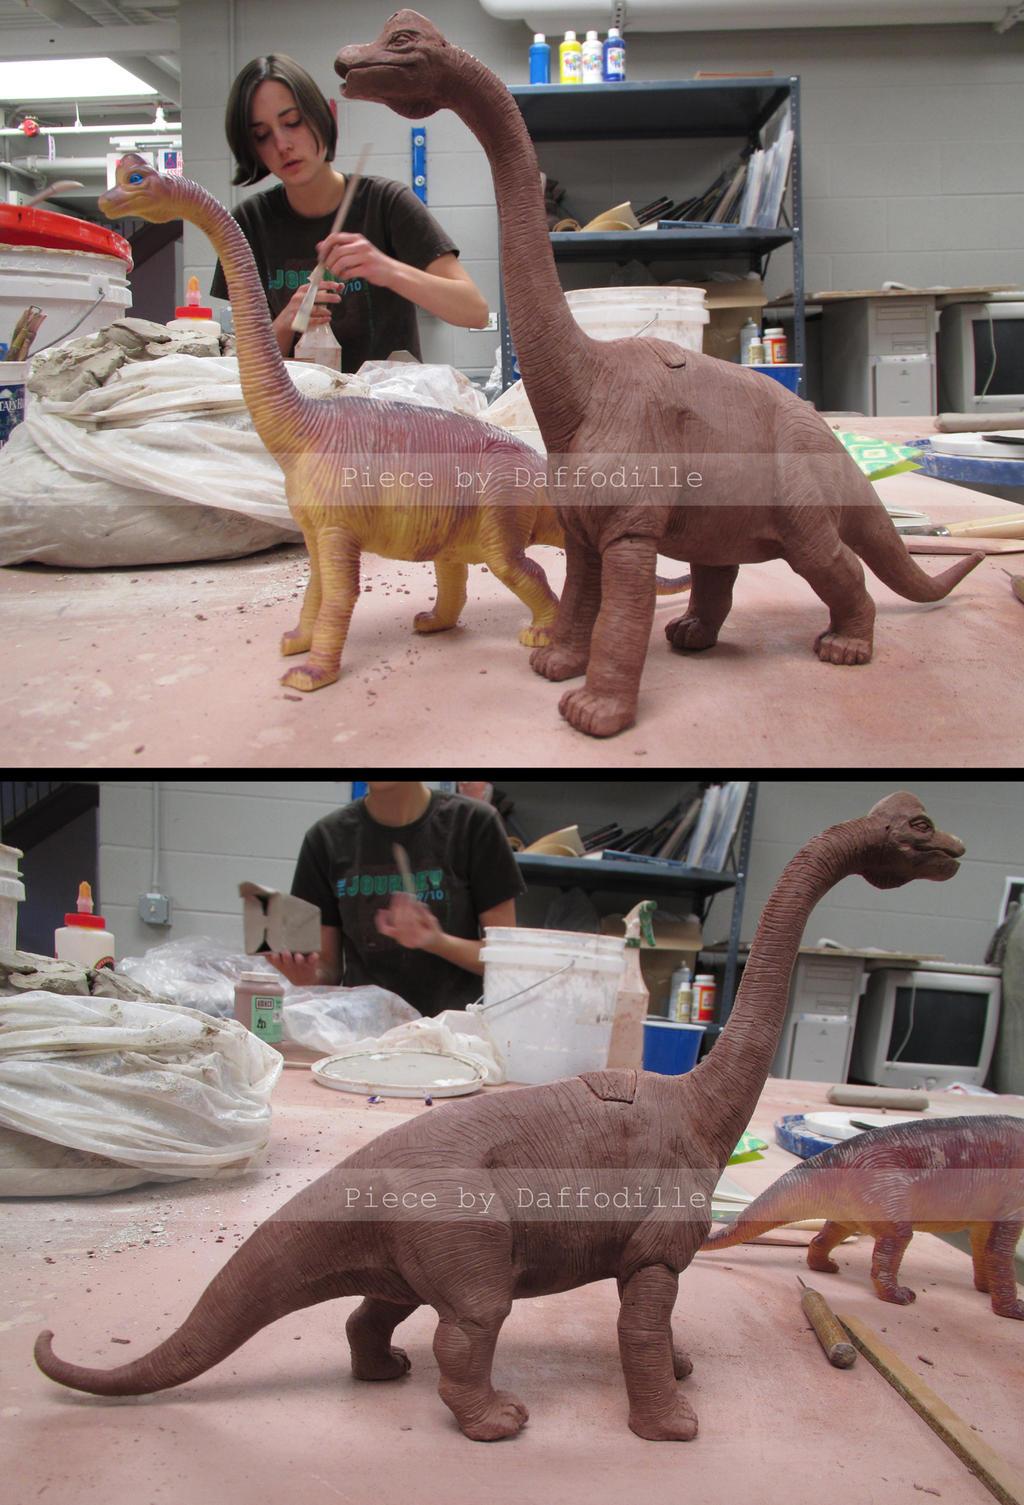 Brachiosaurus Teapot by DaffoDille